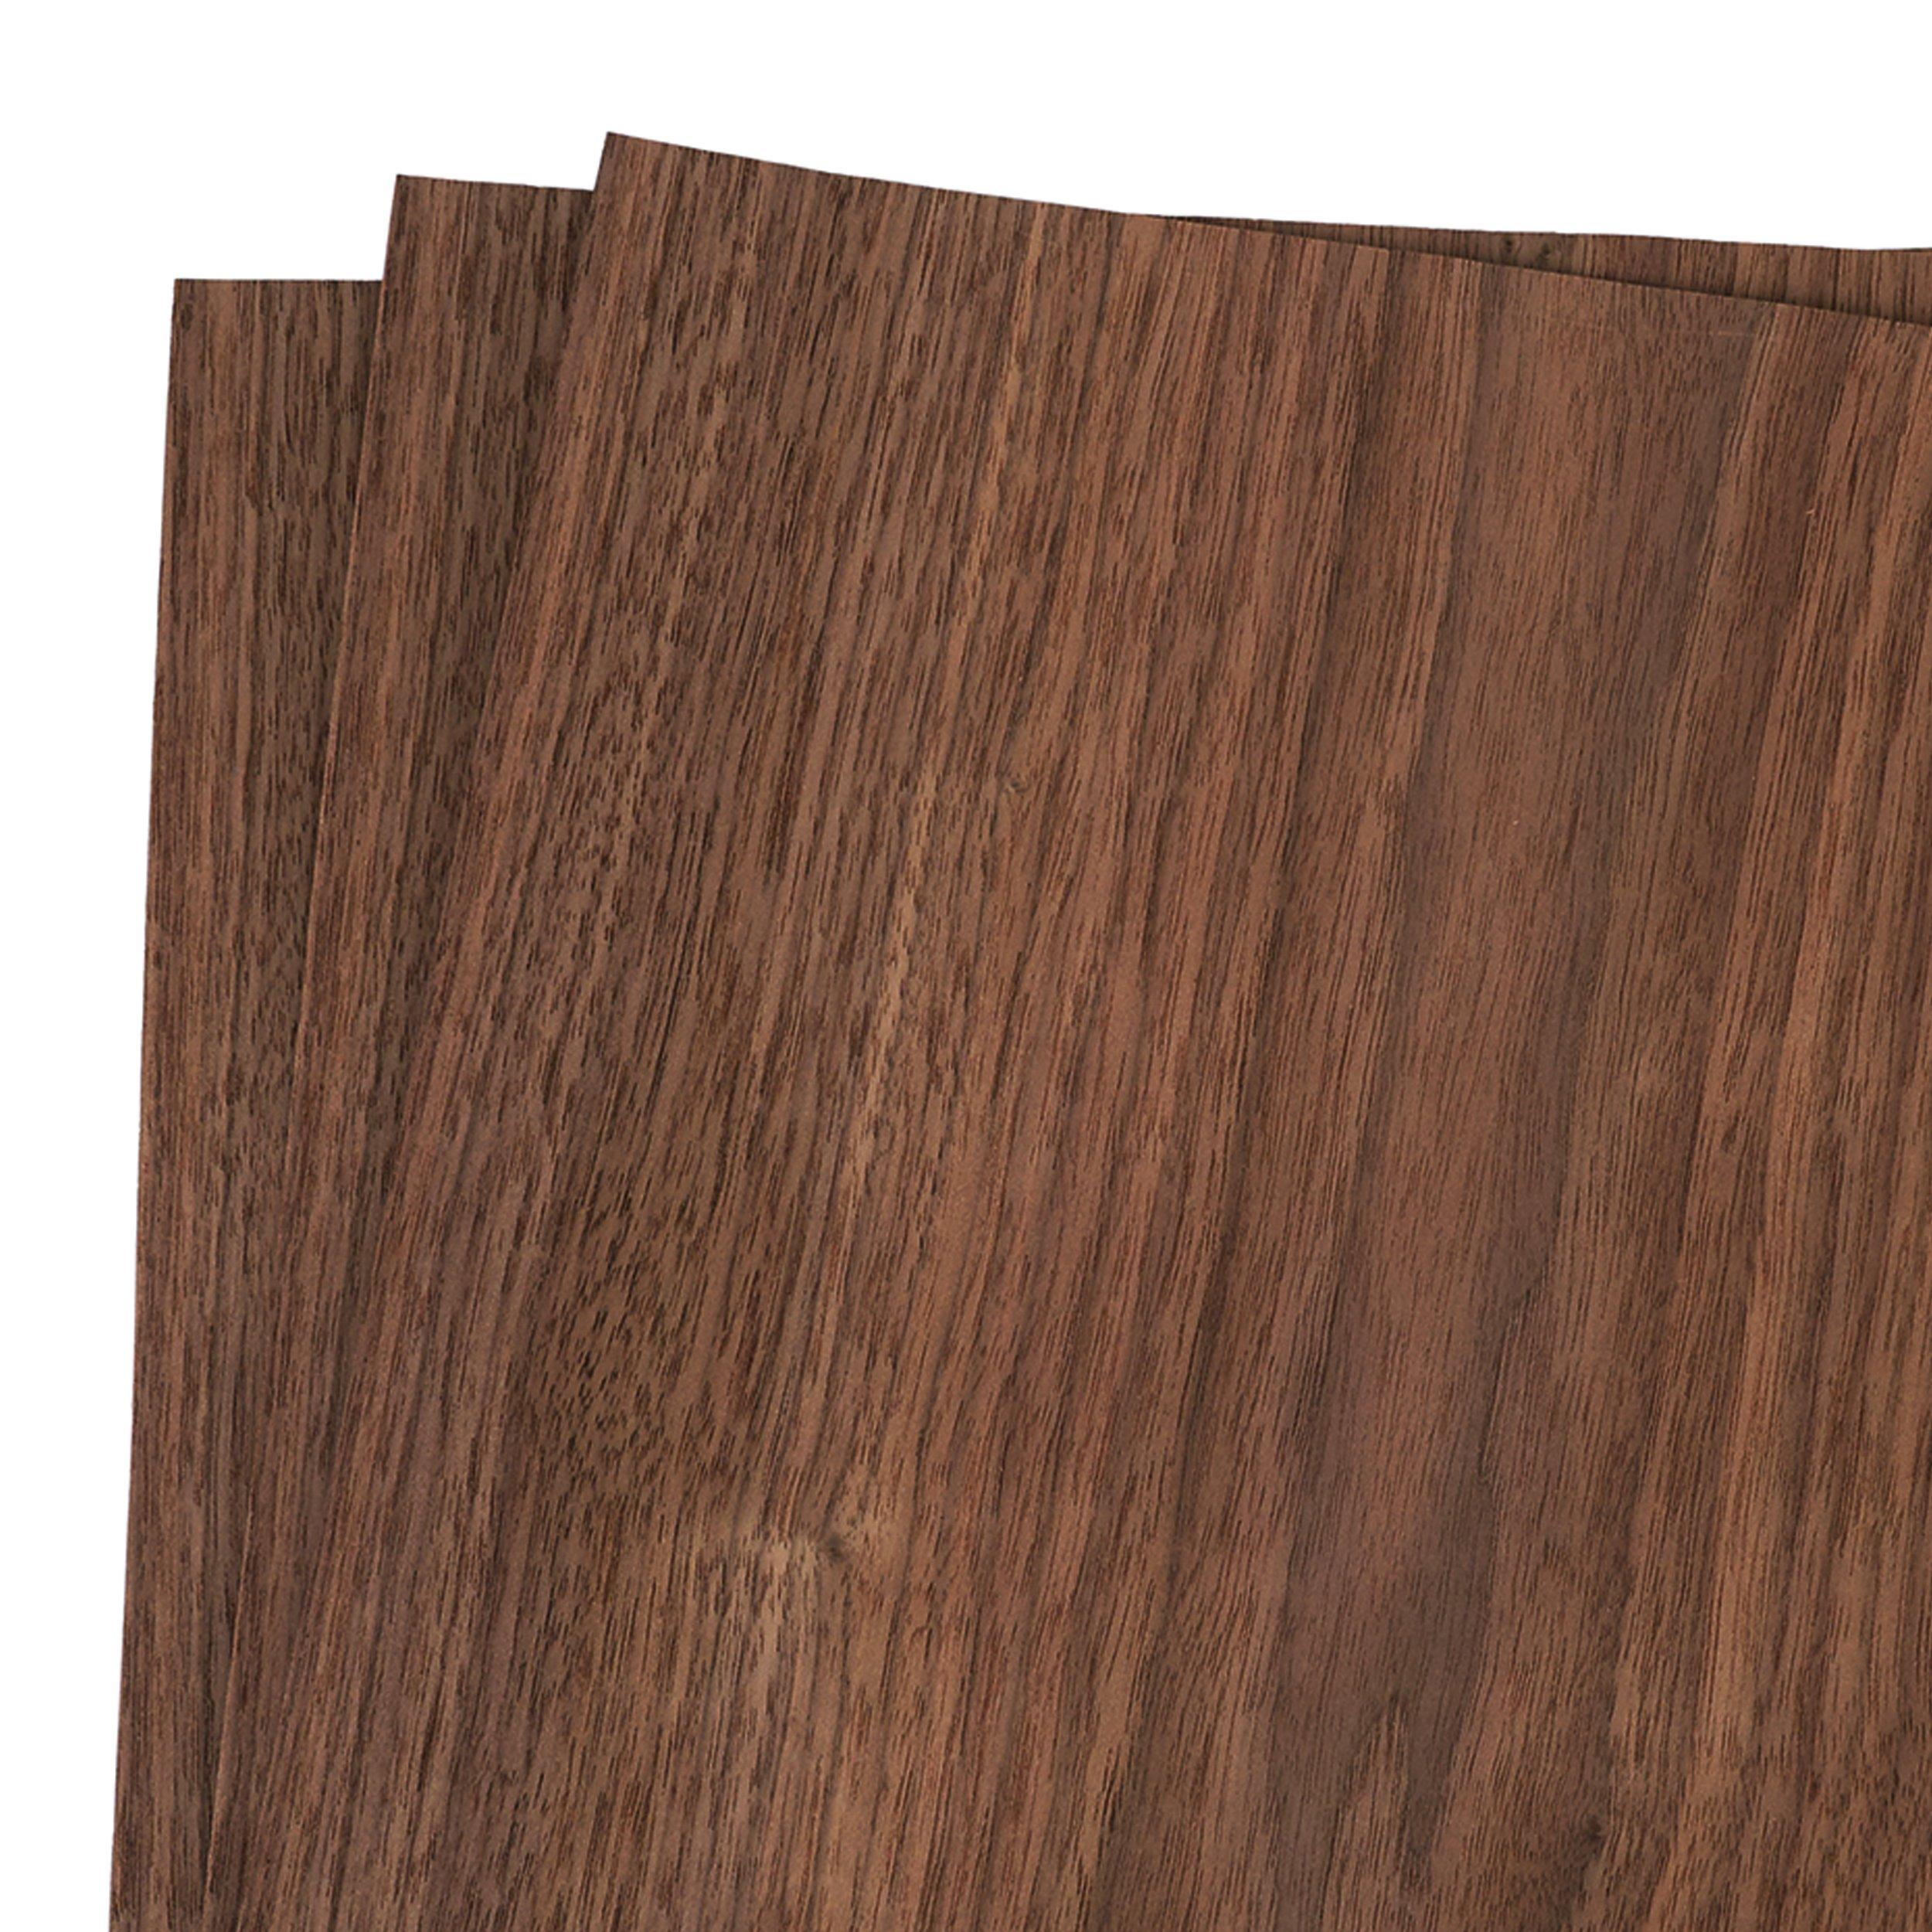 Walnut Veneer 12'' x 12'', 3-Piece